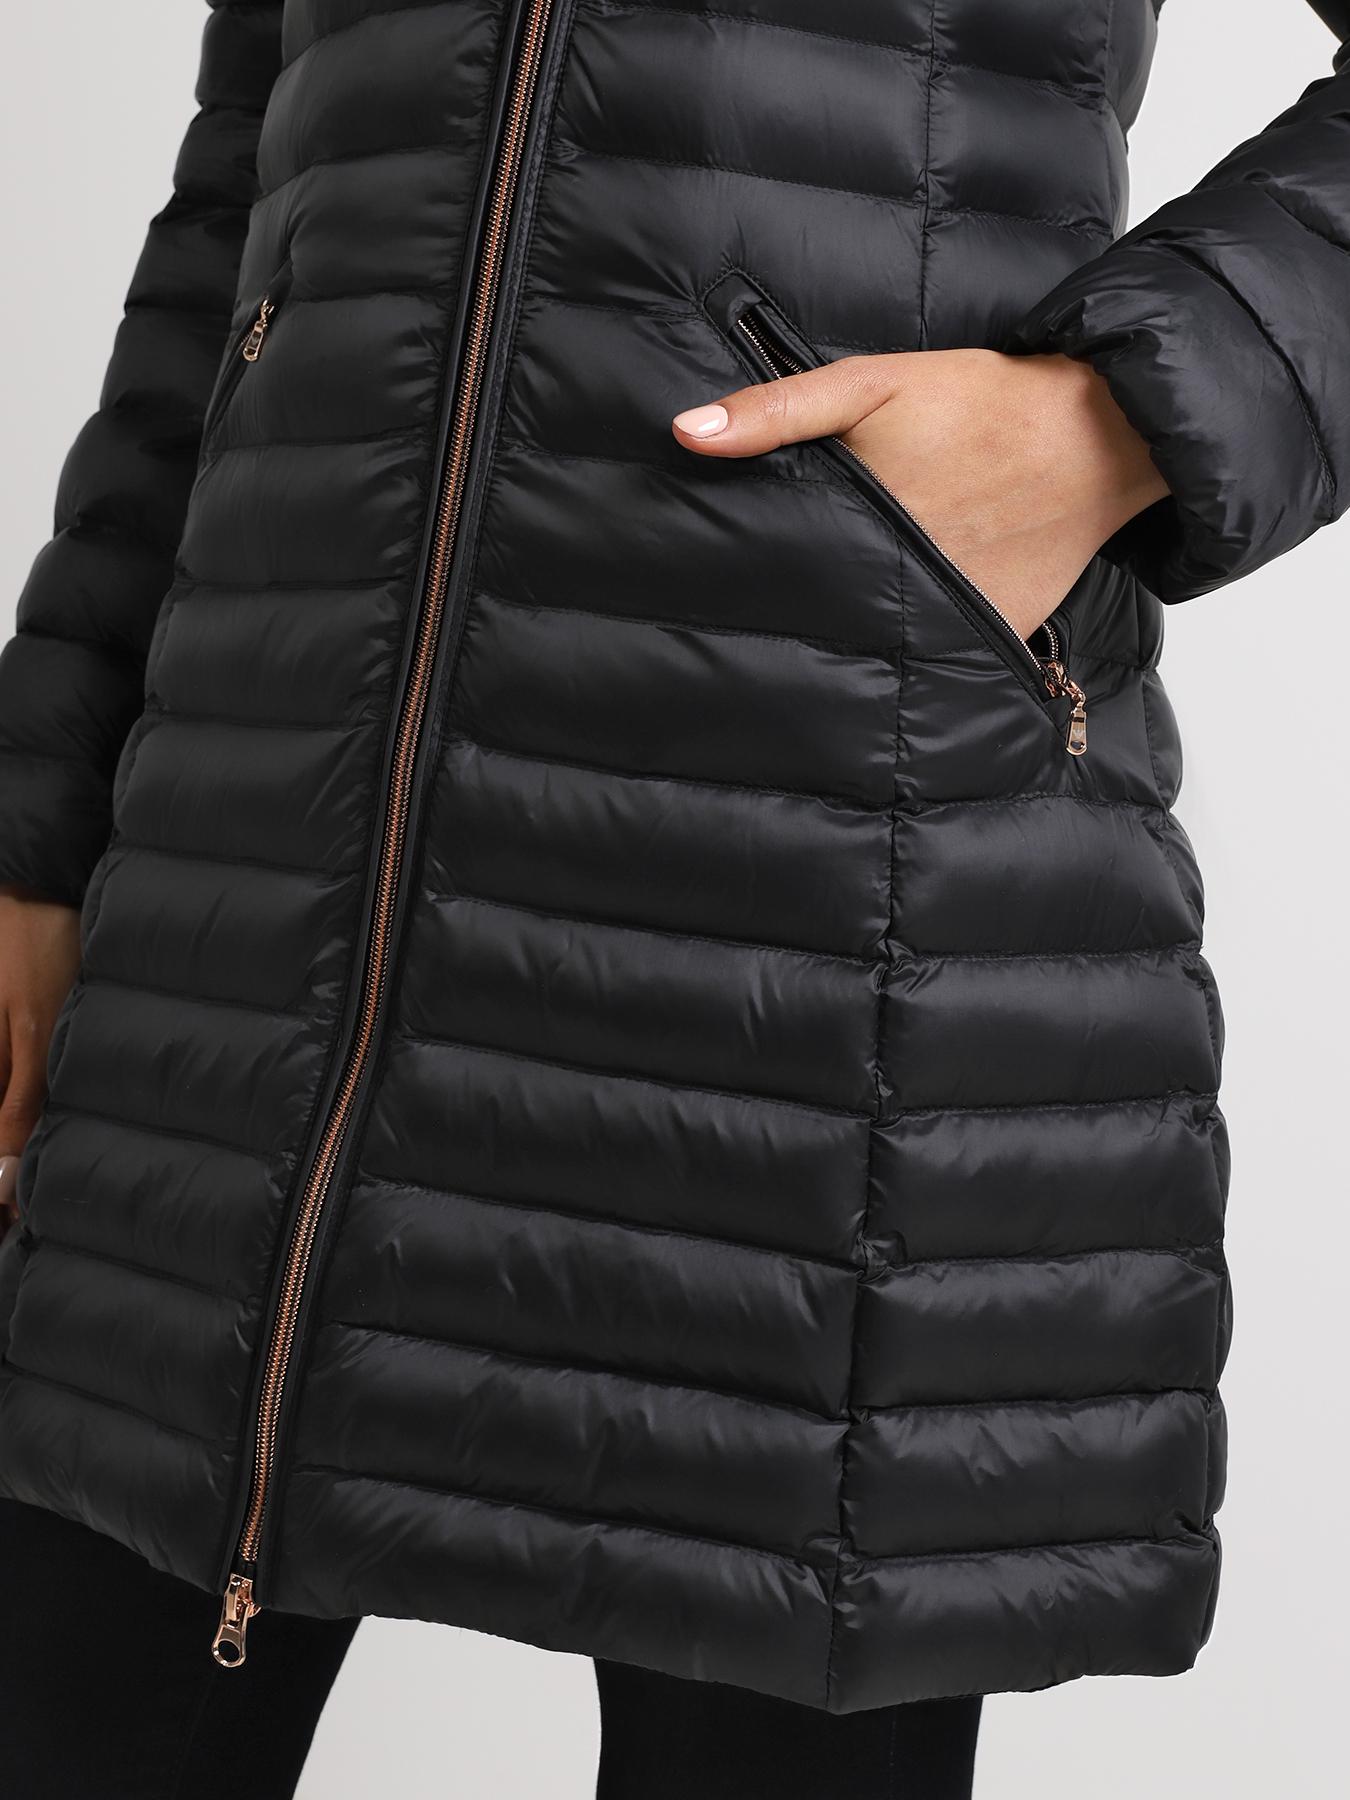 EA7 Emporio Armani Удлиненная куртка 352512-041 Фото 4